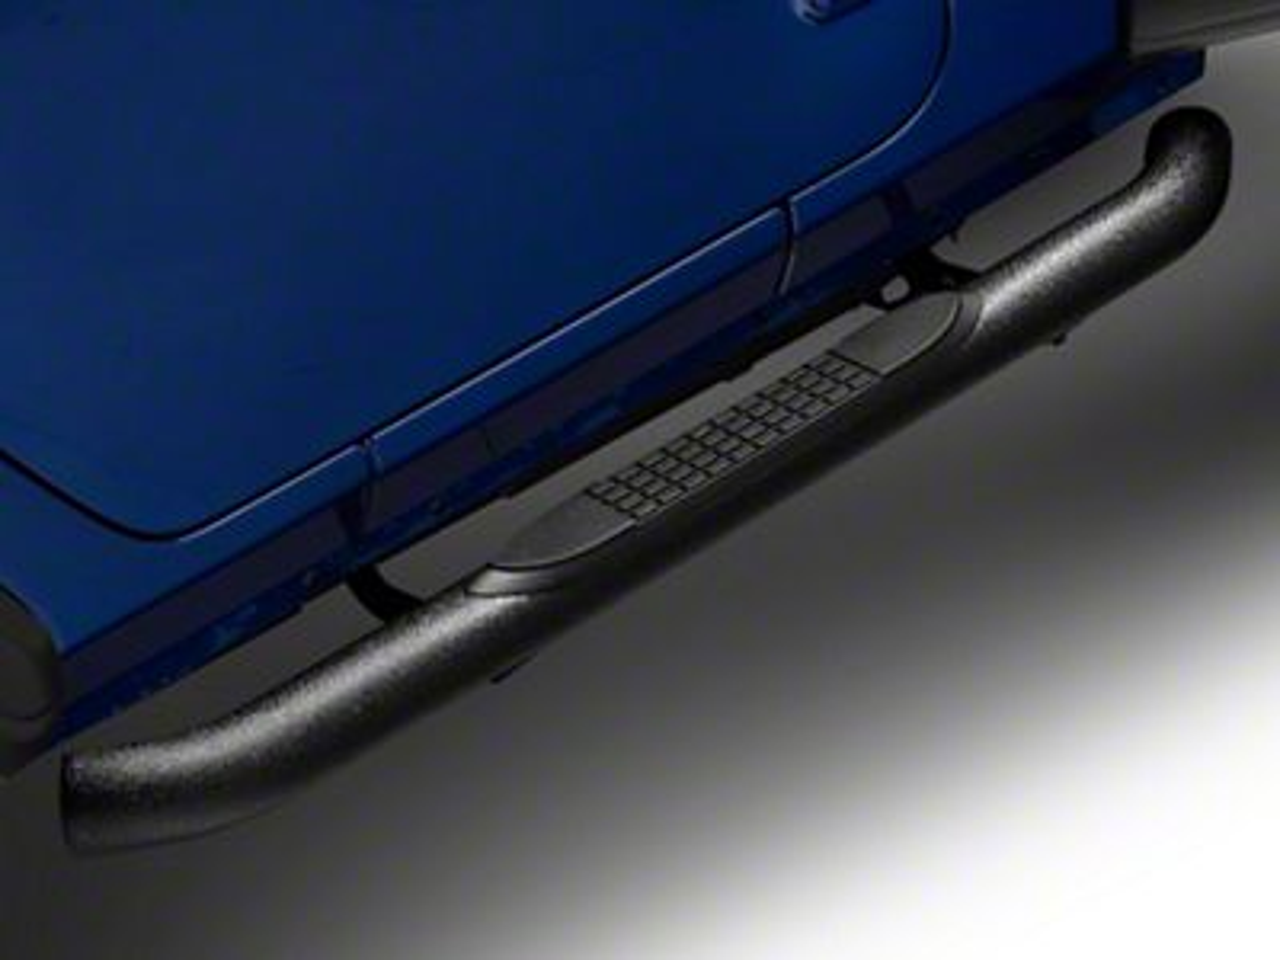 RedRock 4x4 3 in. Round Curved Side Step Bars - Textured Black (18-19 Jeep Wrangler JL 2 Door)